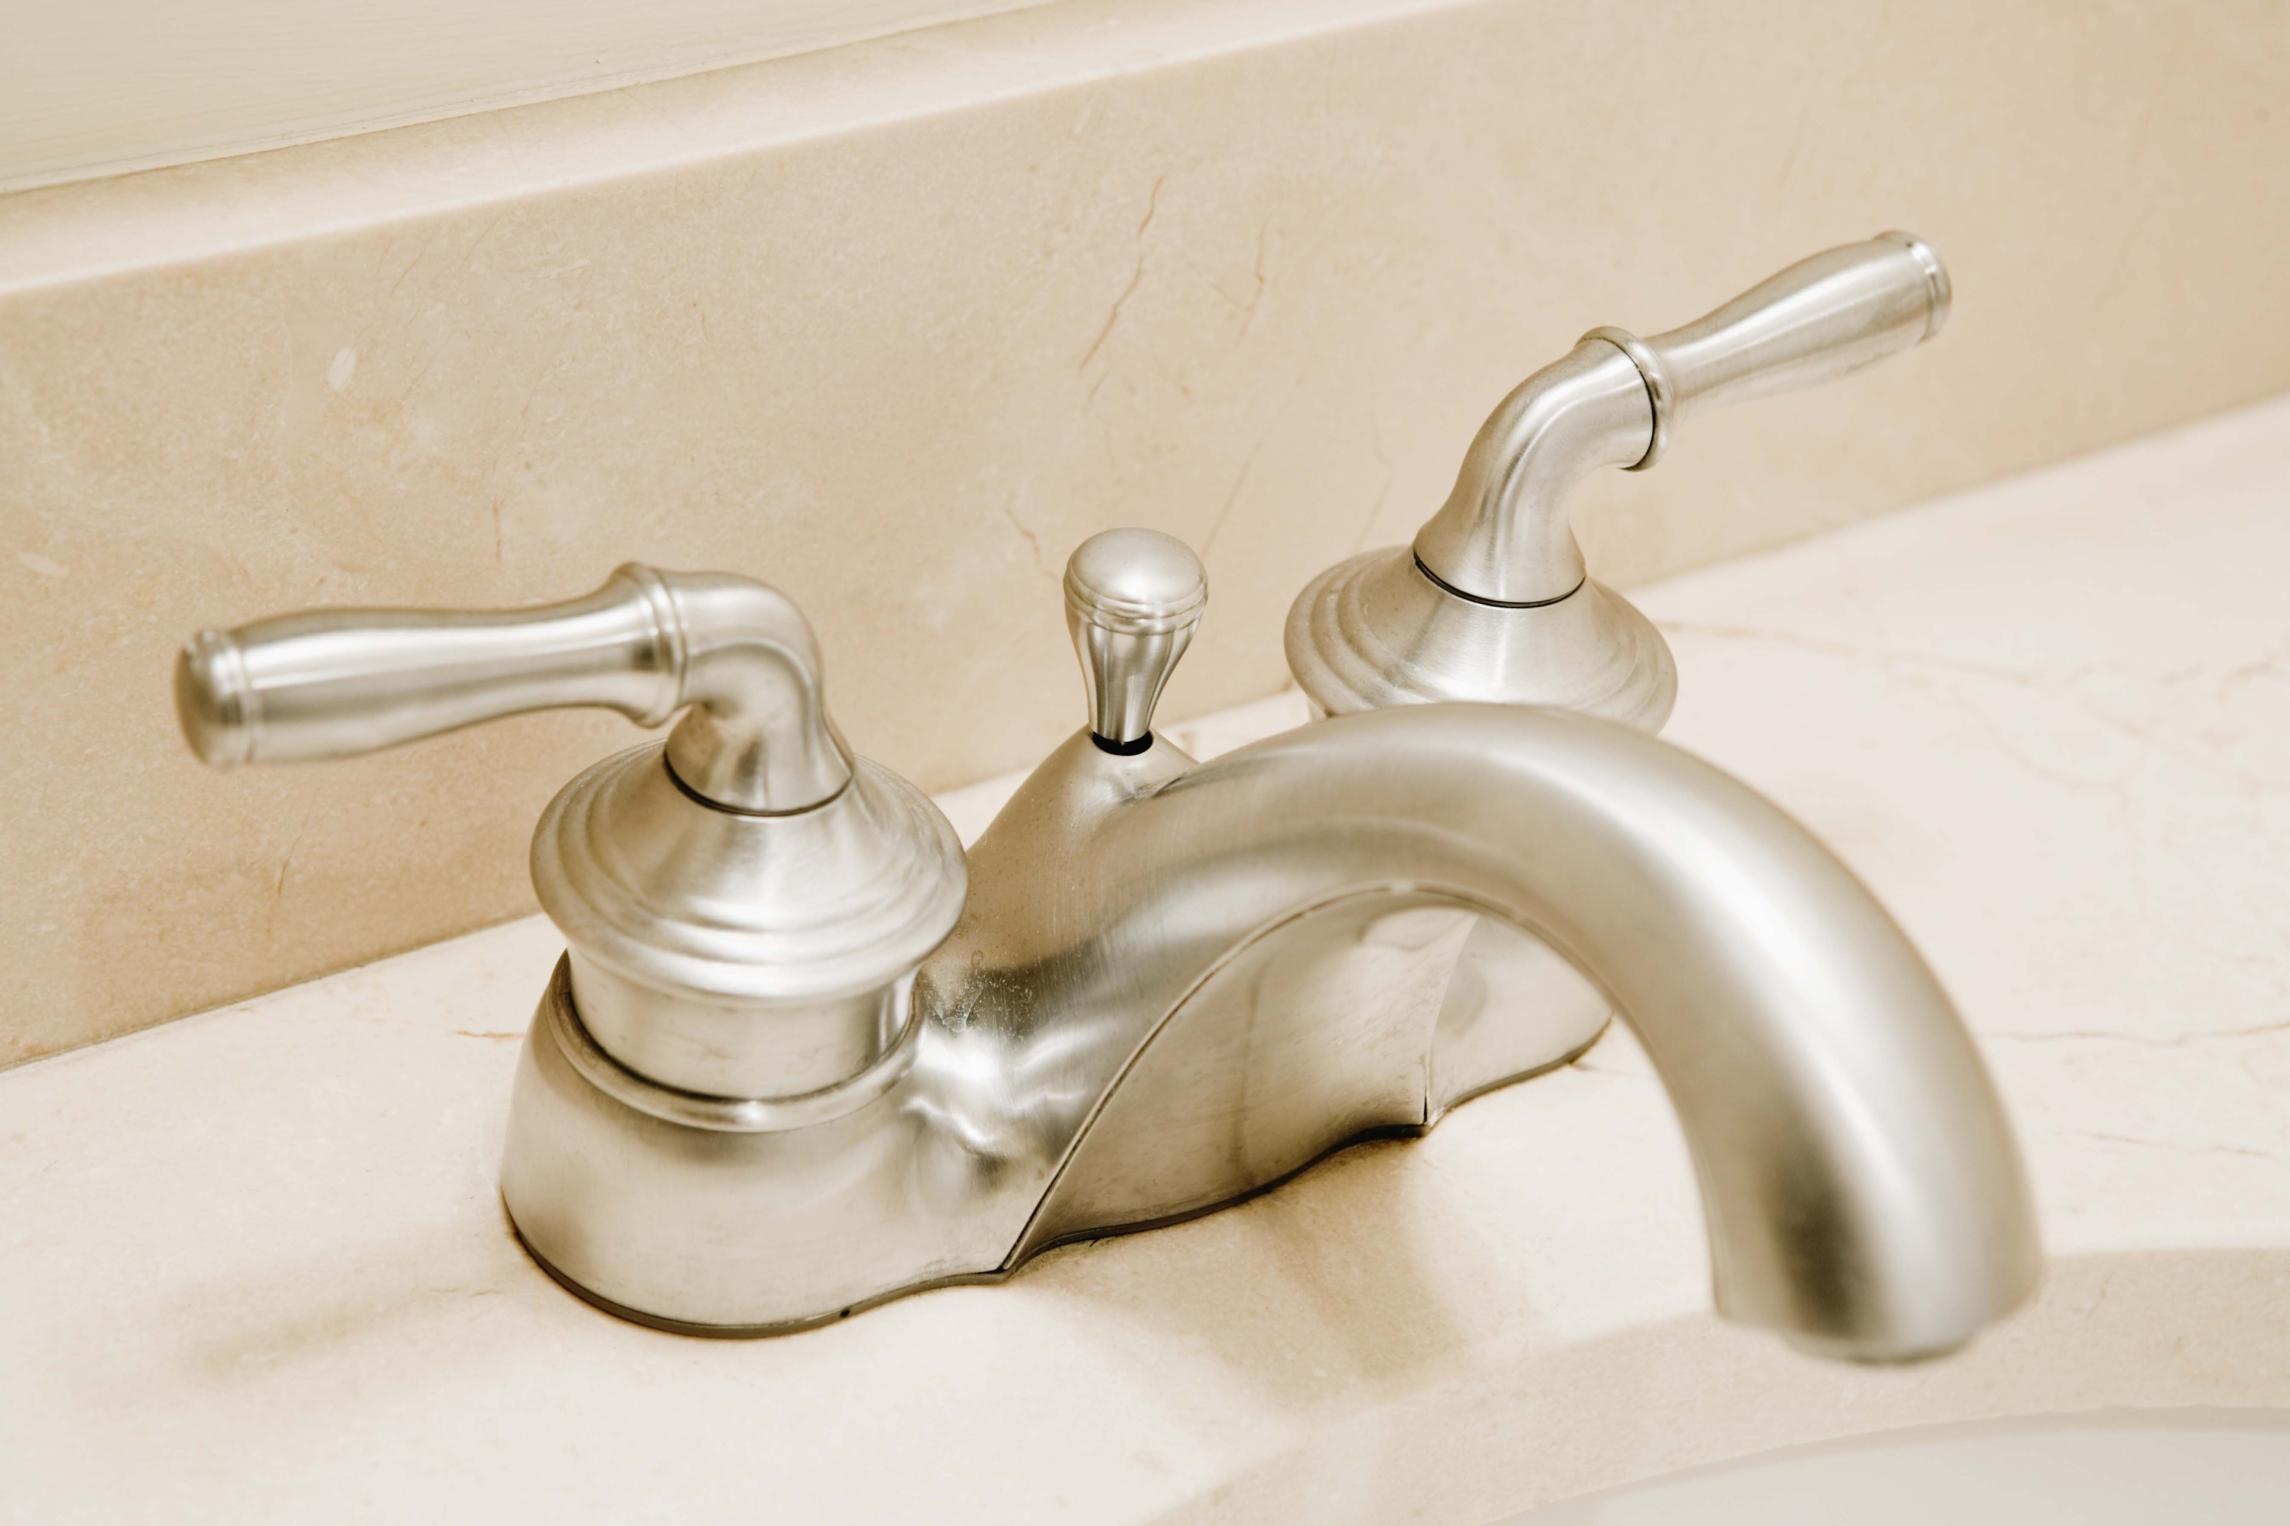 bathroom faucet how to fix bathroom sink faucet handle